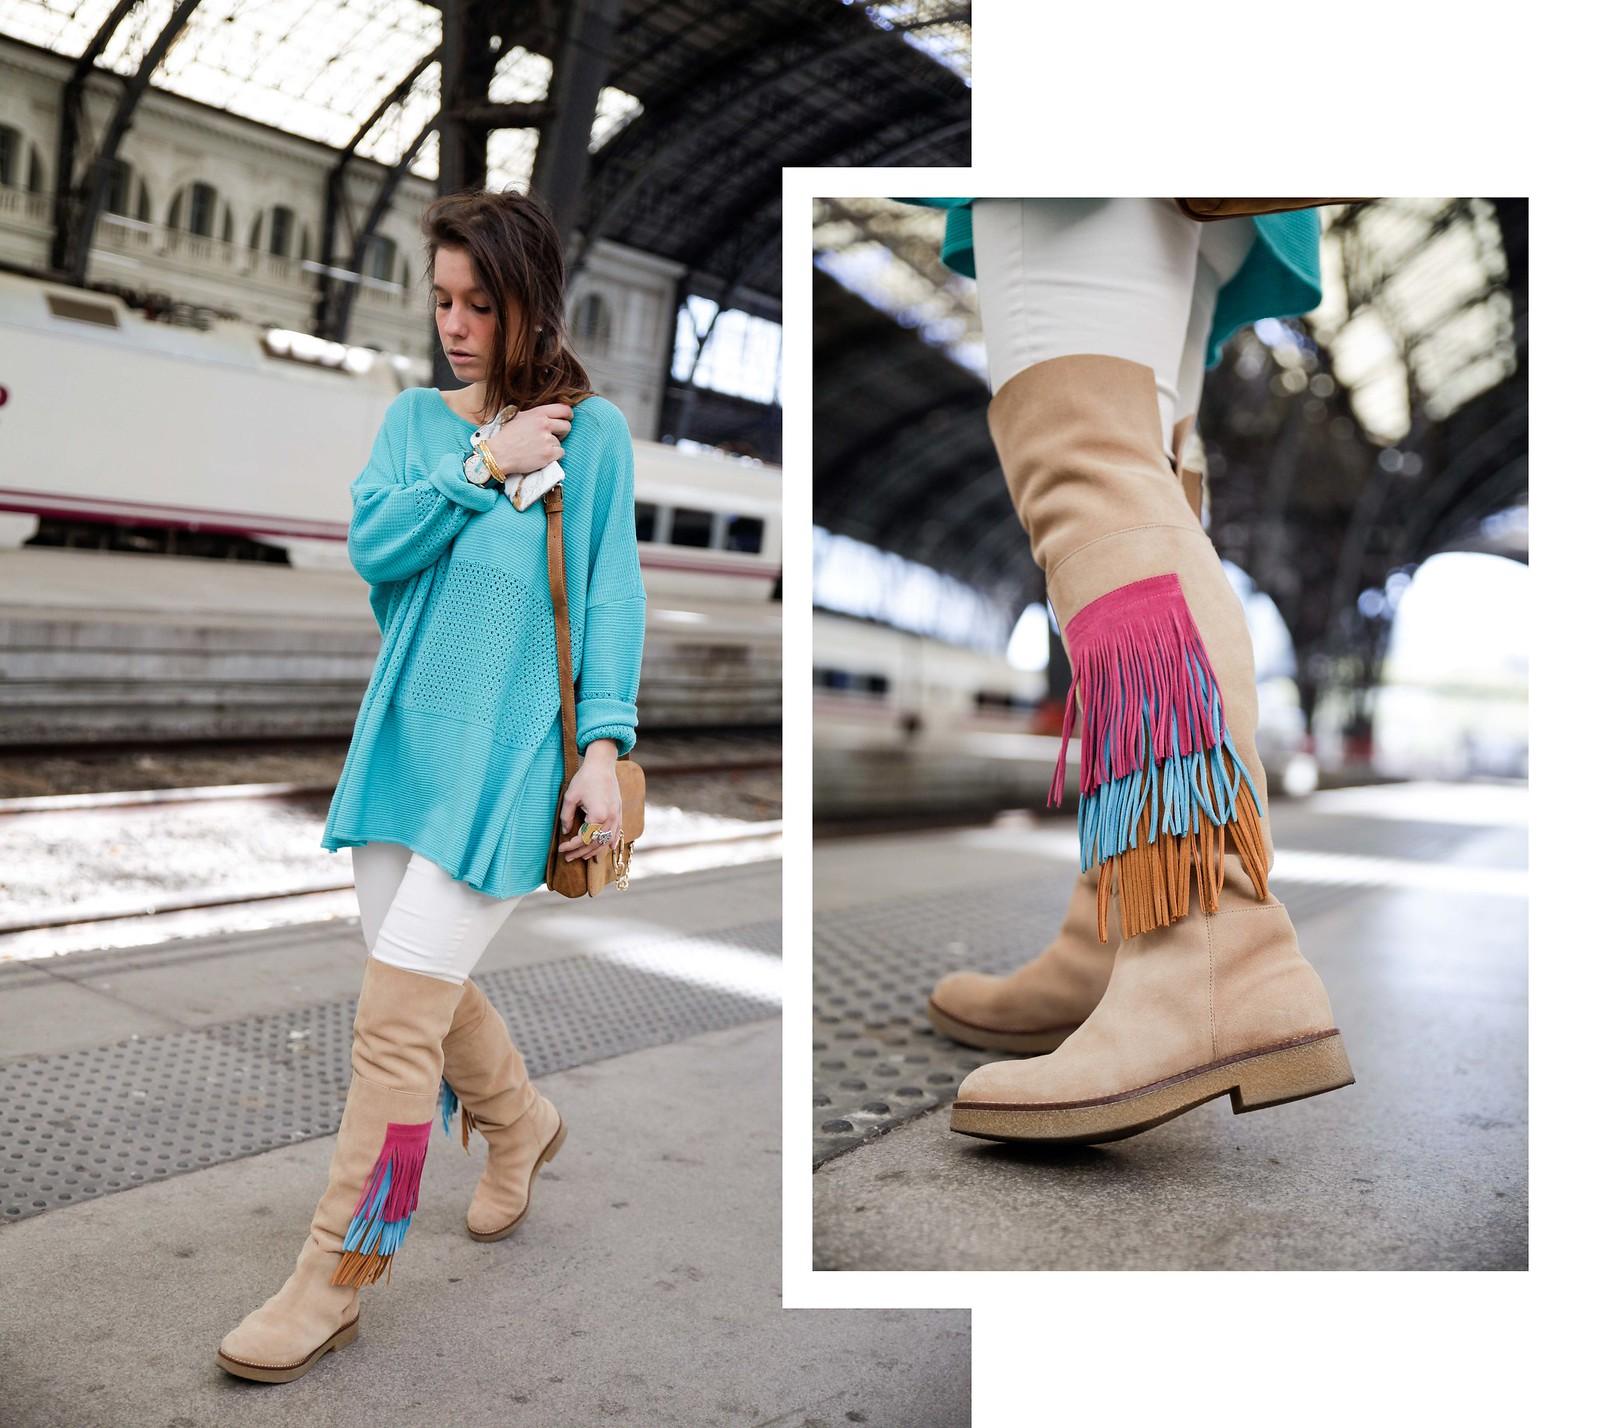 011_como_combinar_la_ropa_verde_turquesa_ideas_look_street_style_theguestgirl_ruga_boots_fringes_barcelona_influencer_top_blogger